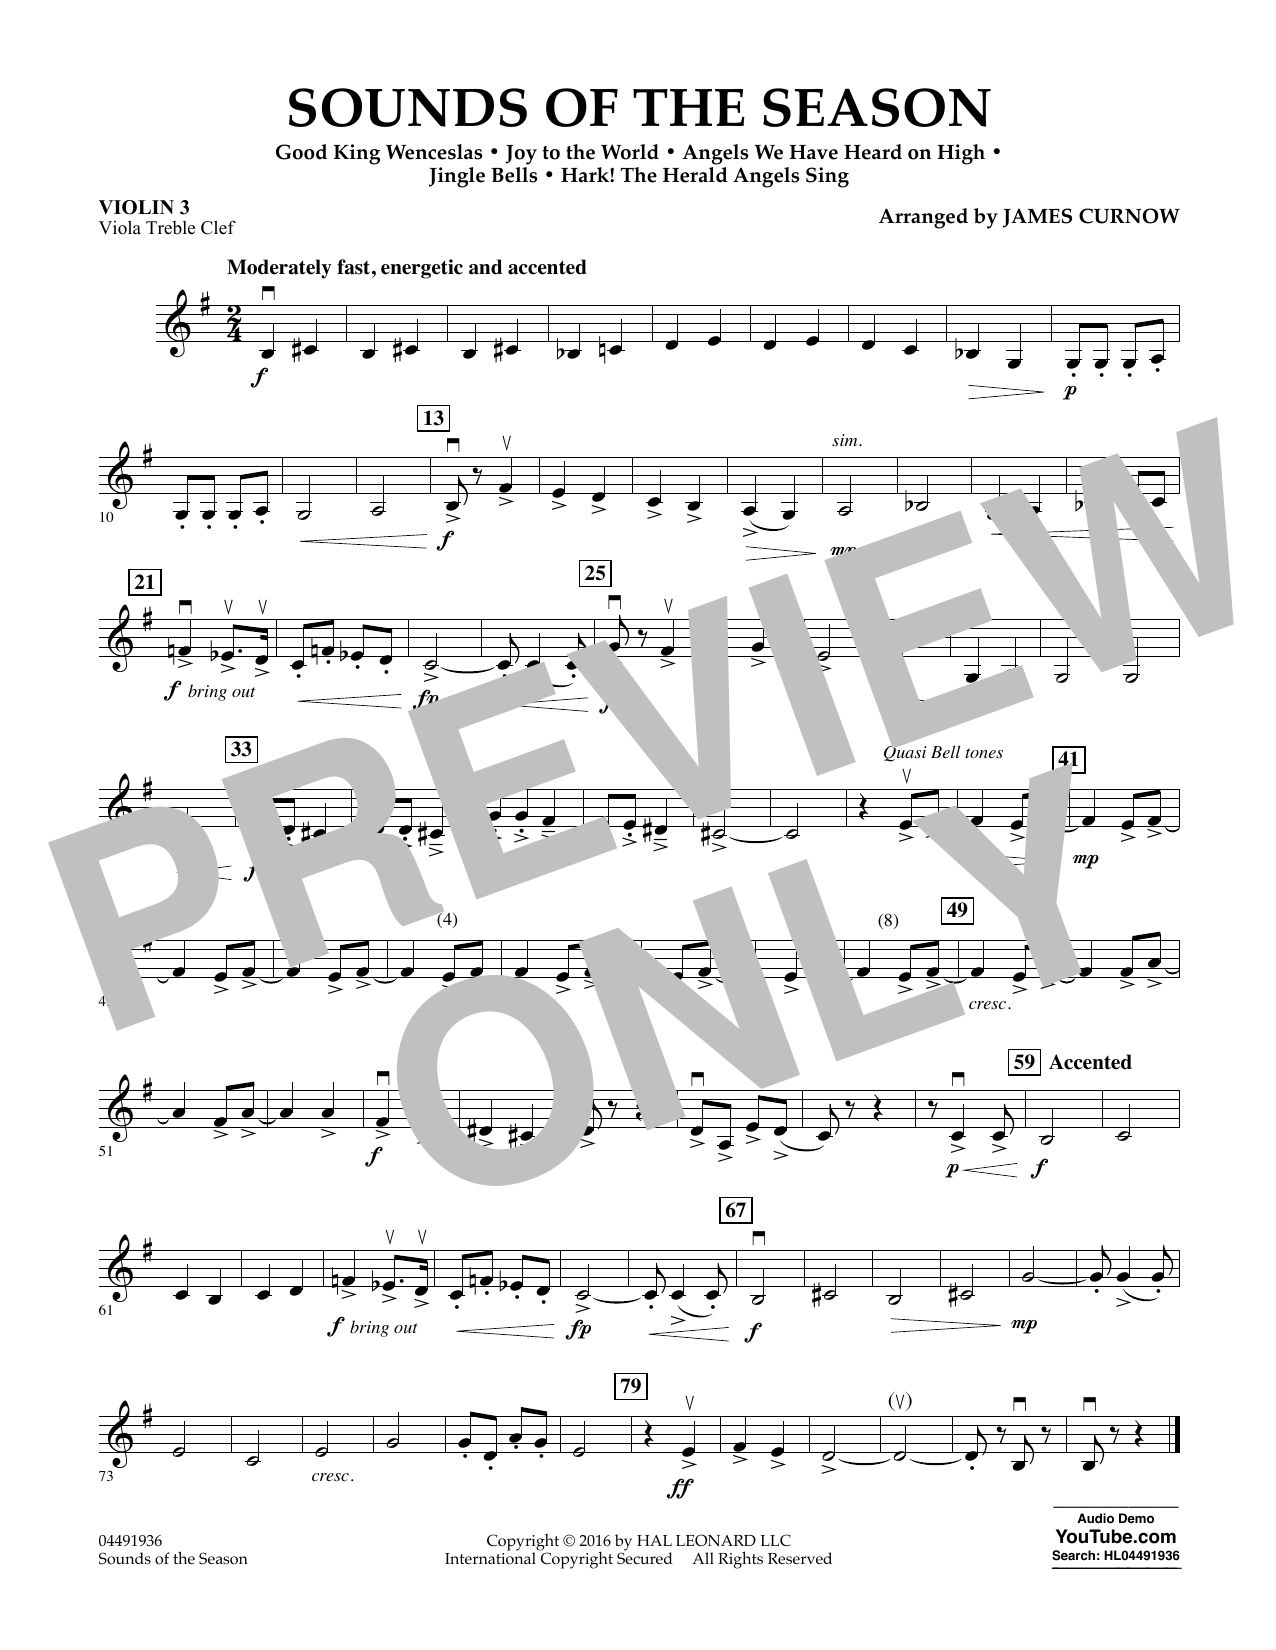 Sounds of the Season - Violin 3 (Viola Treble Clef) Sheet Music